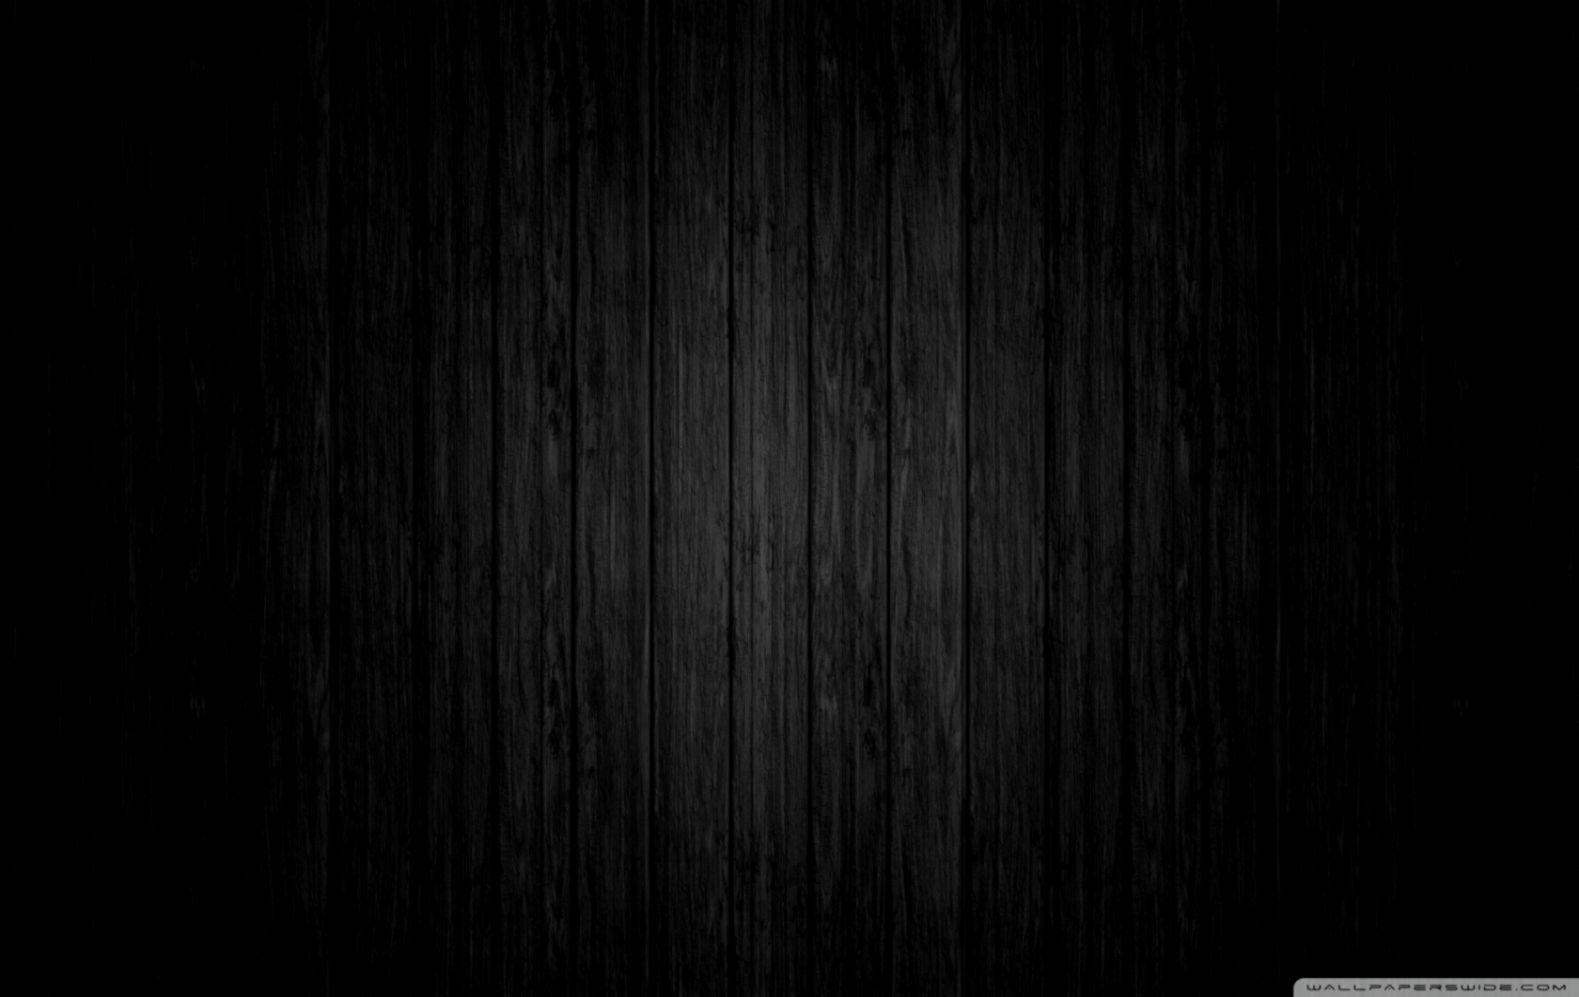 Black Background 4k Wallpaper